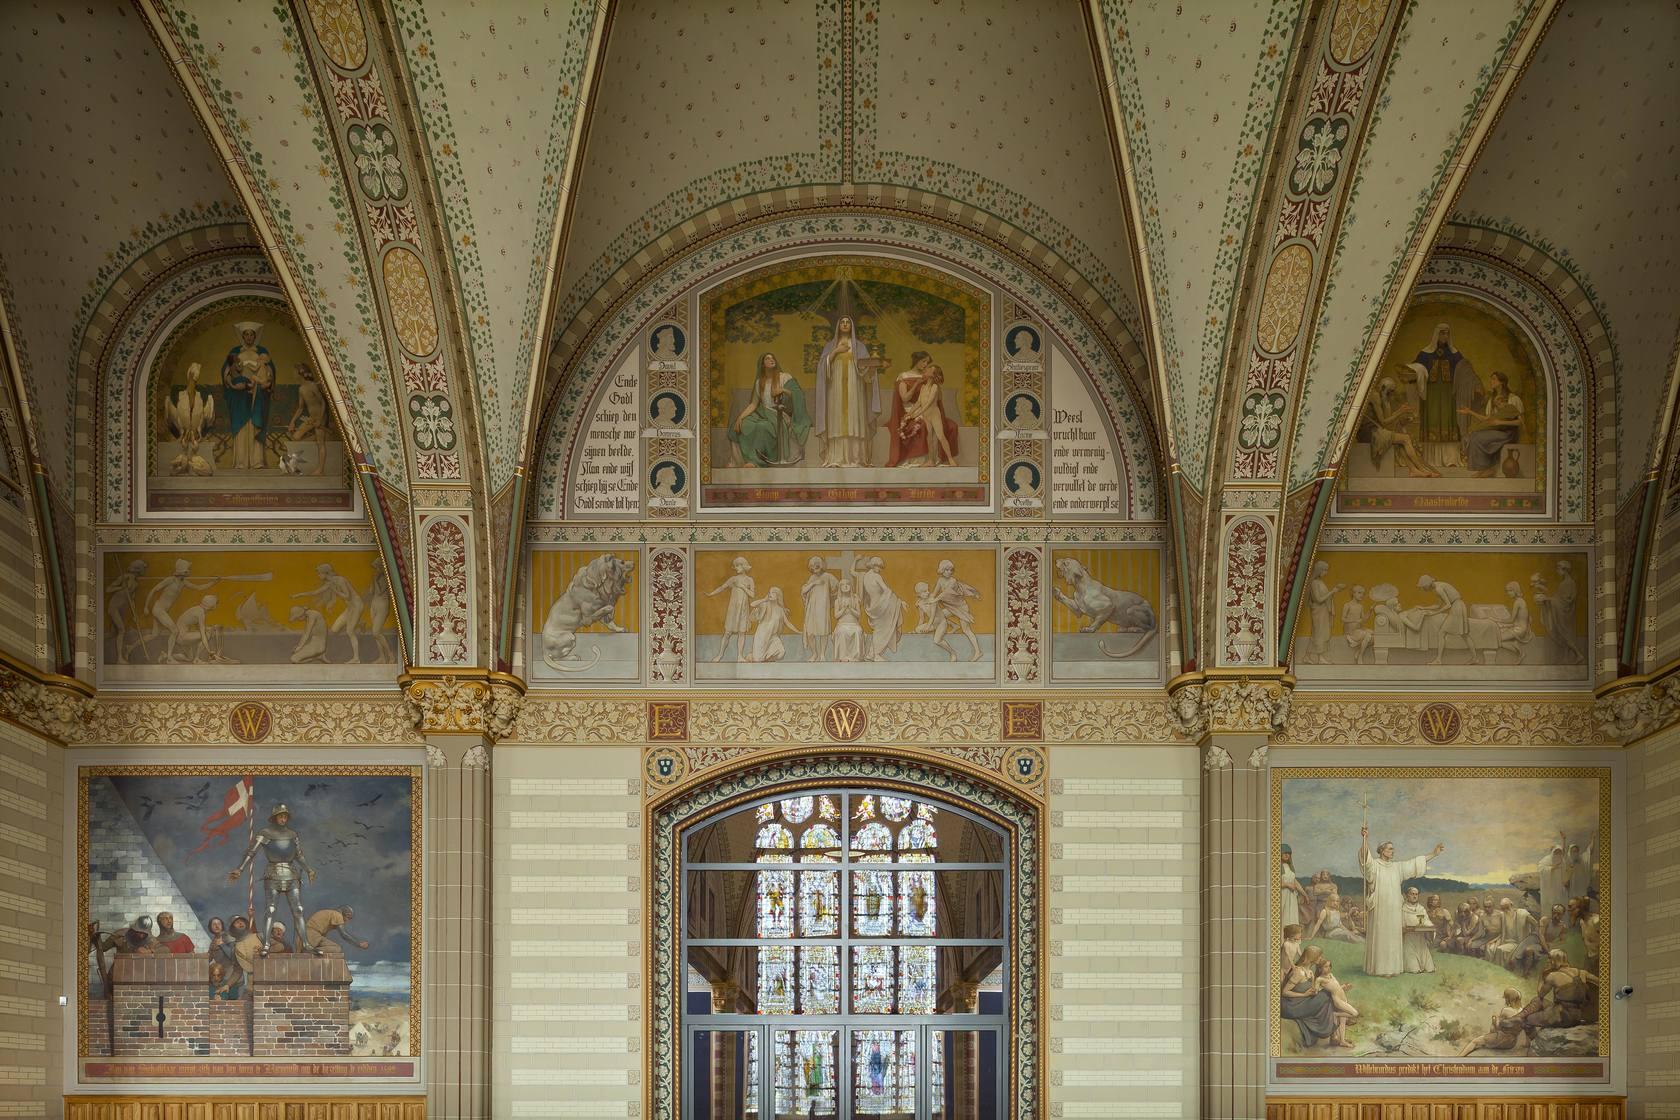 Cruz y Ortiz resucitan el Rijksmuseum